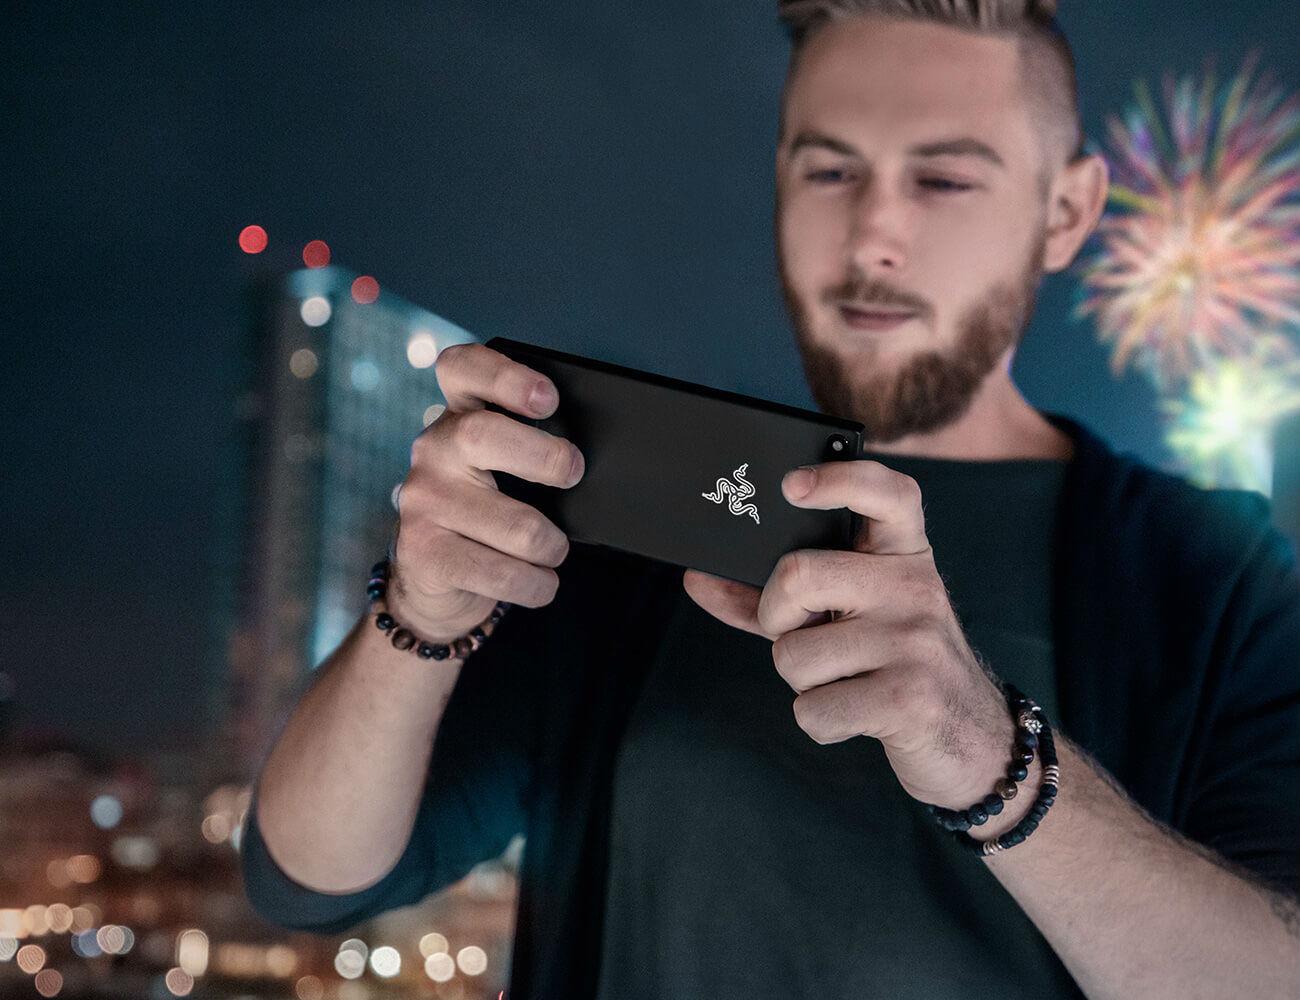 Razer Phone – Smartphone for Gamers